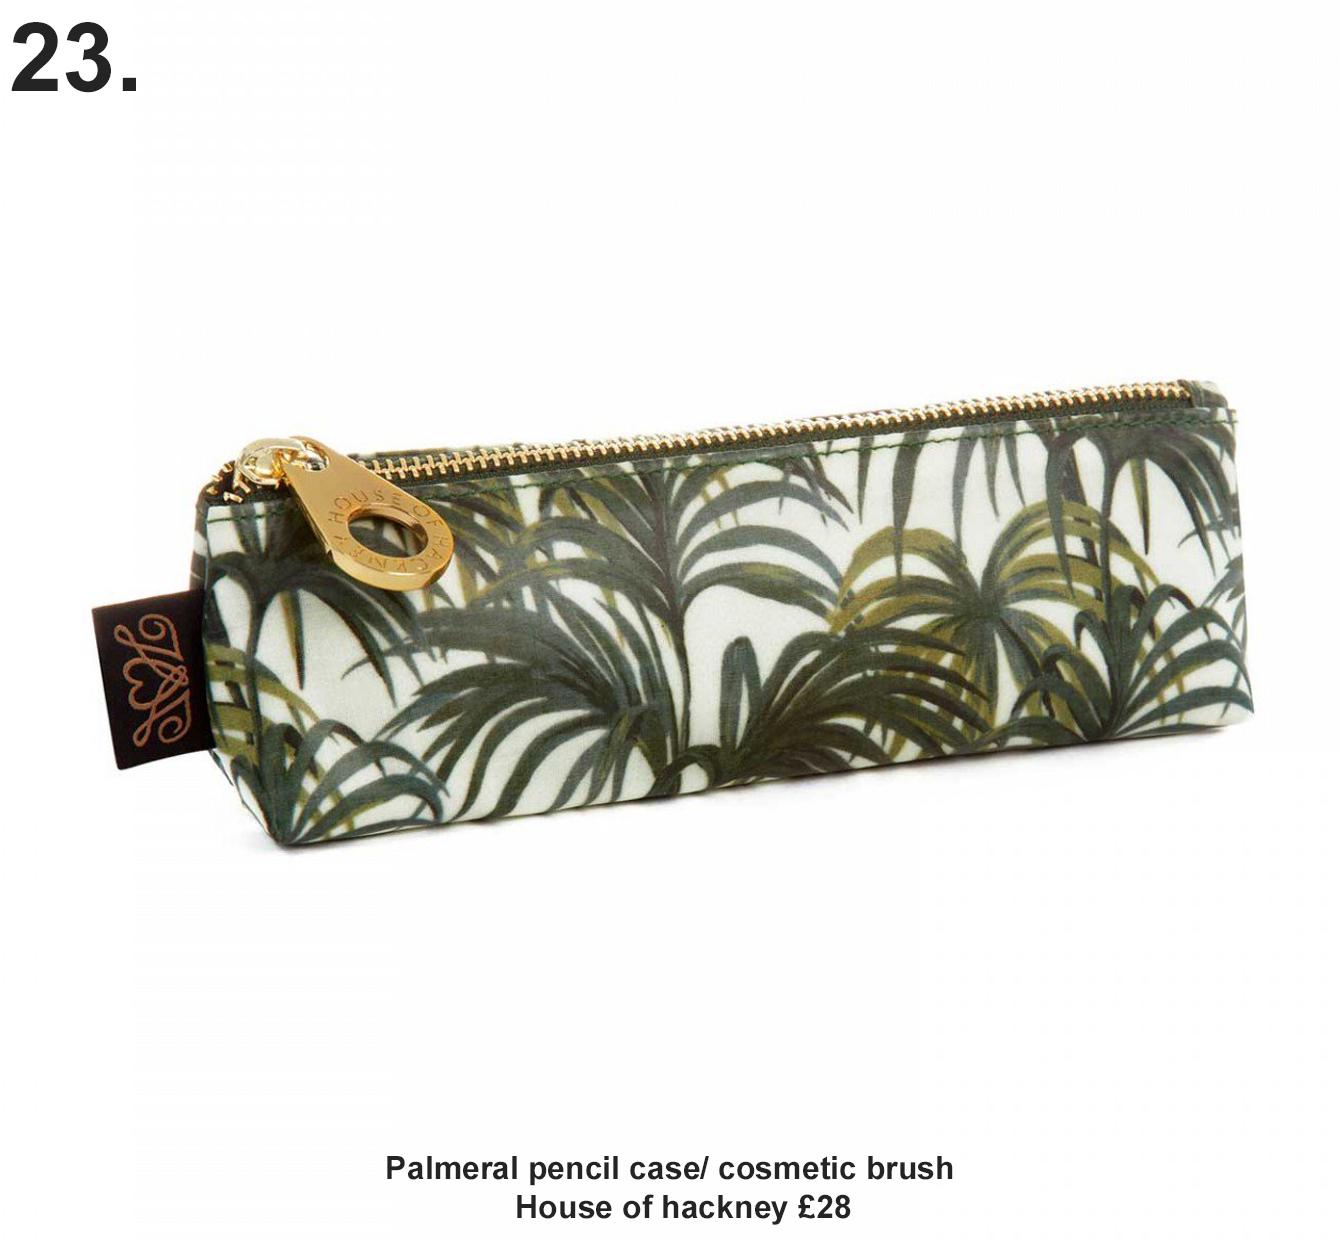 PALMERAL PENCIL CASE / COSMETIC BRUSH CASE - WHITE / GREEN £28